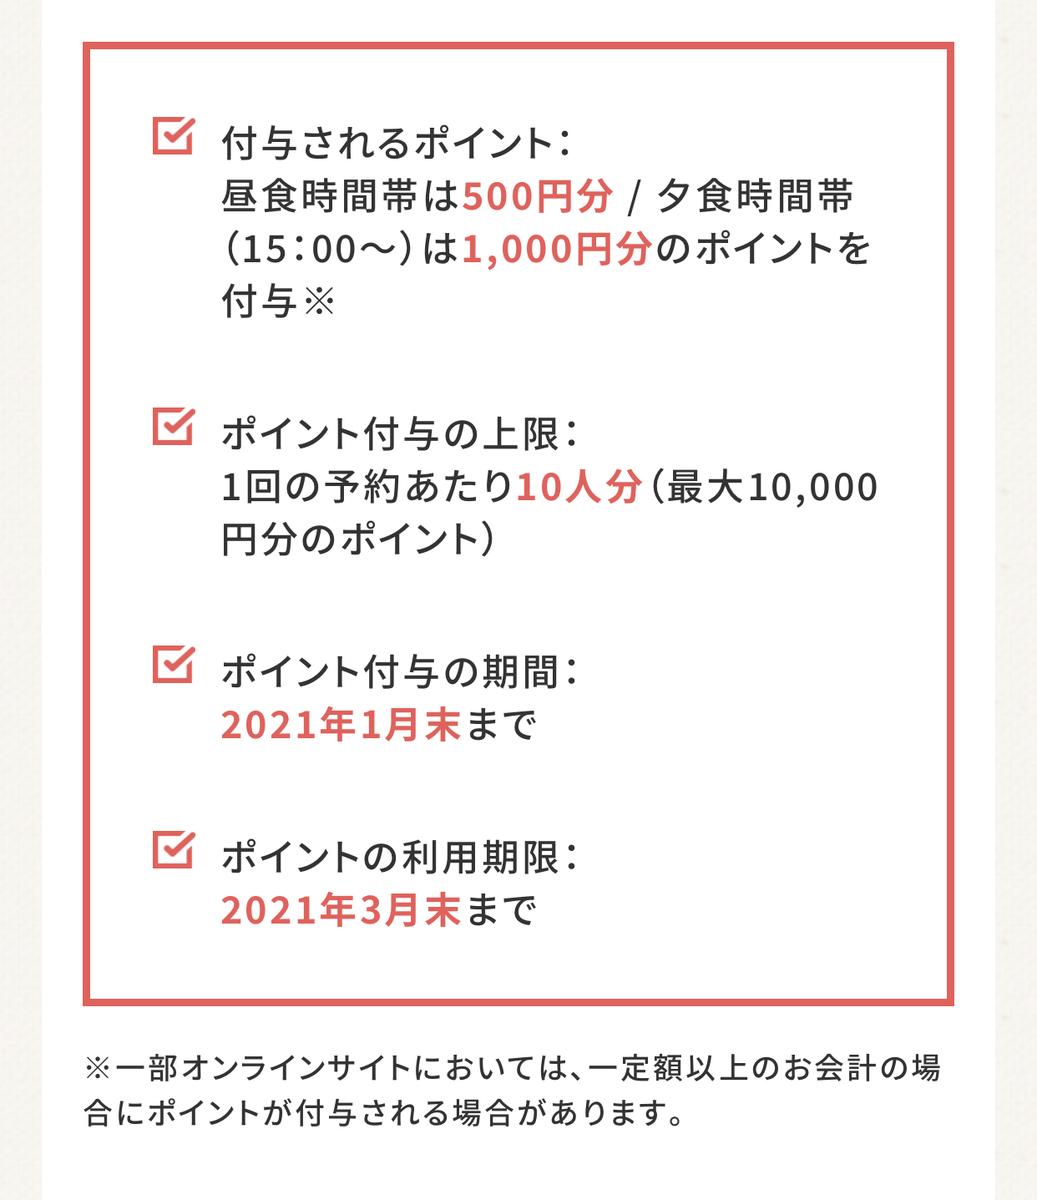 f:id:gino10mugi:20201004101850j:plain